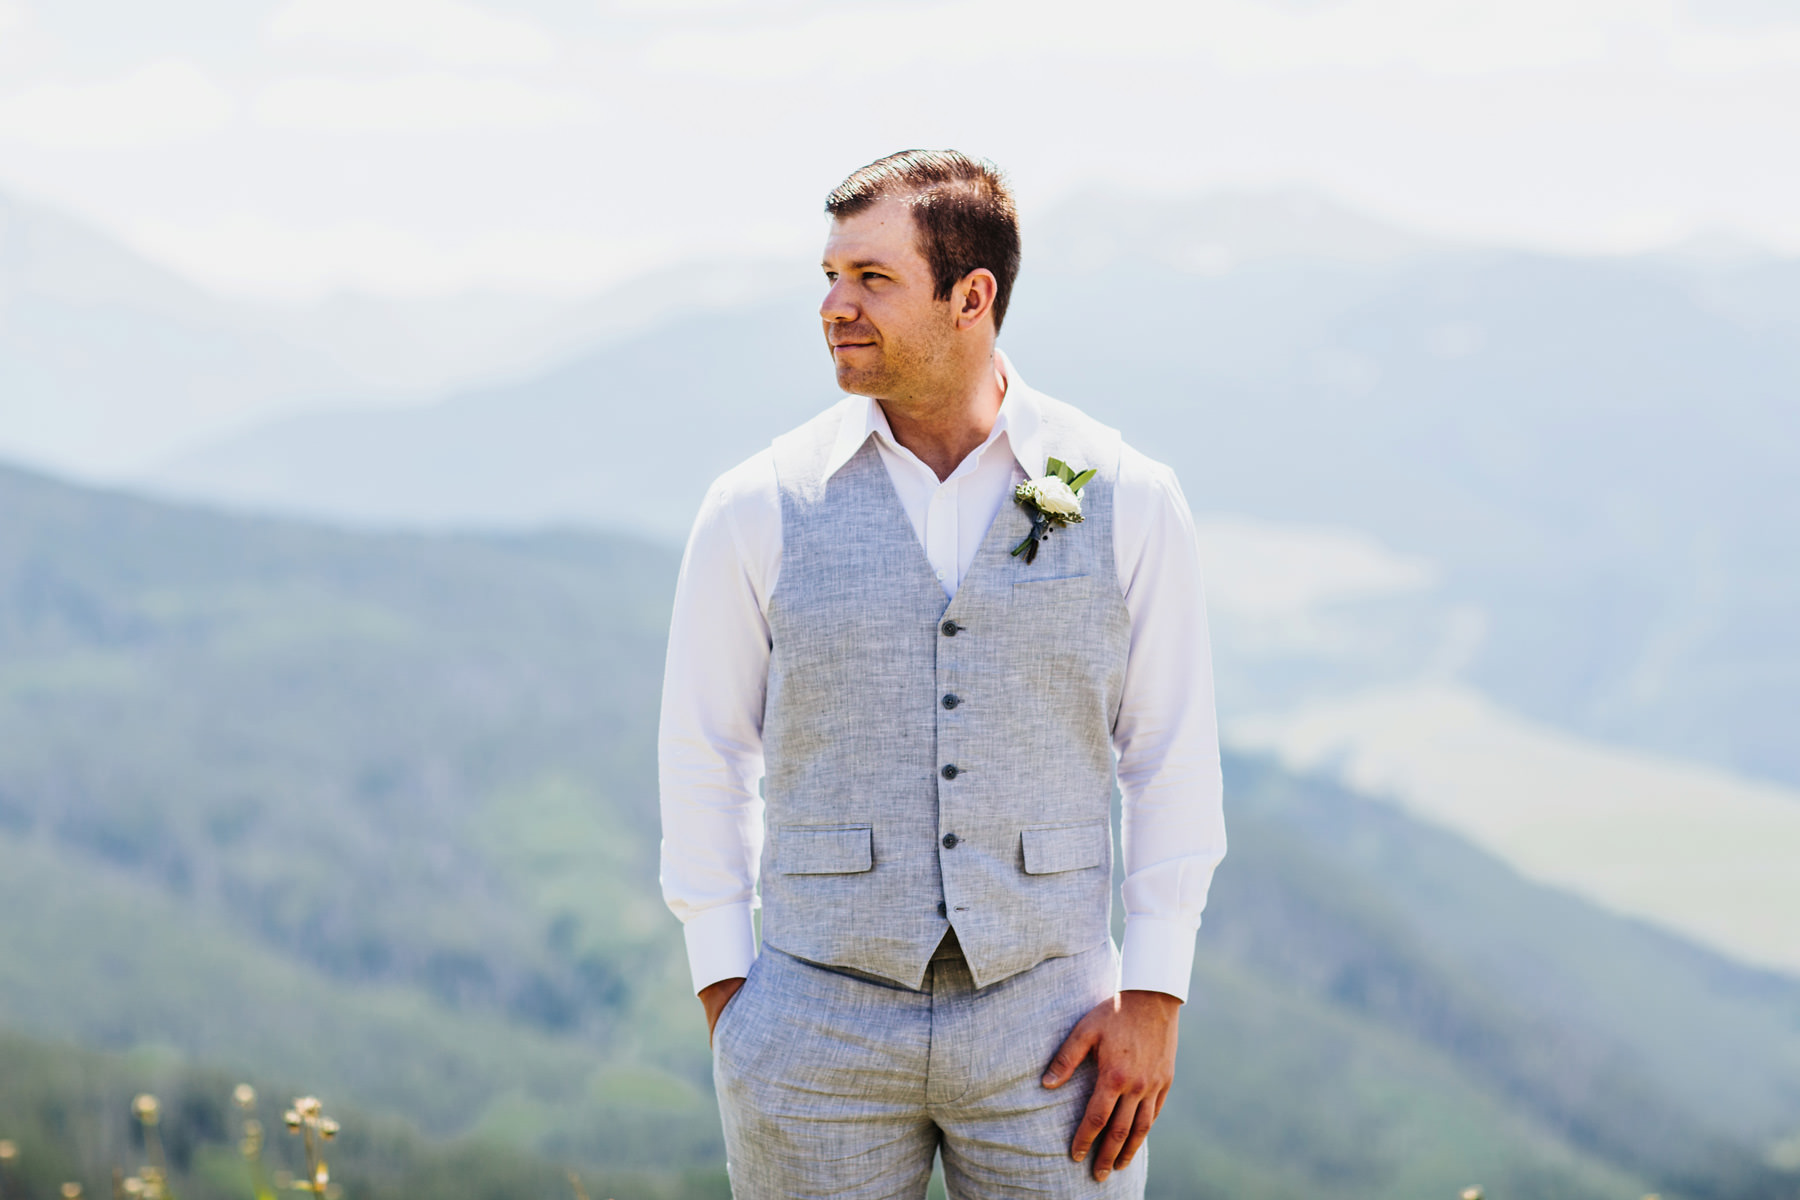 Vail Colorado Wedding Deck_ Kindling Wedding Photography29.JPG